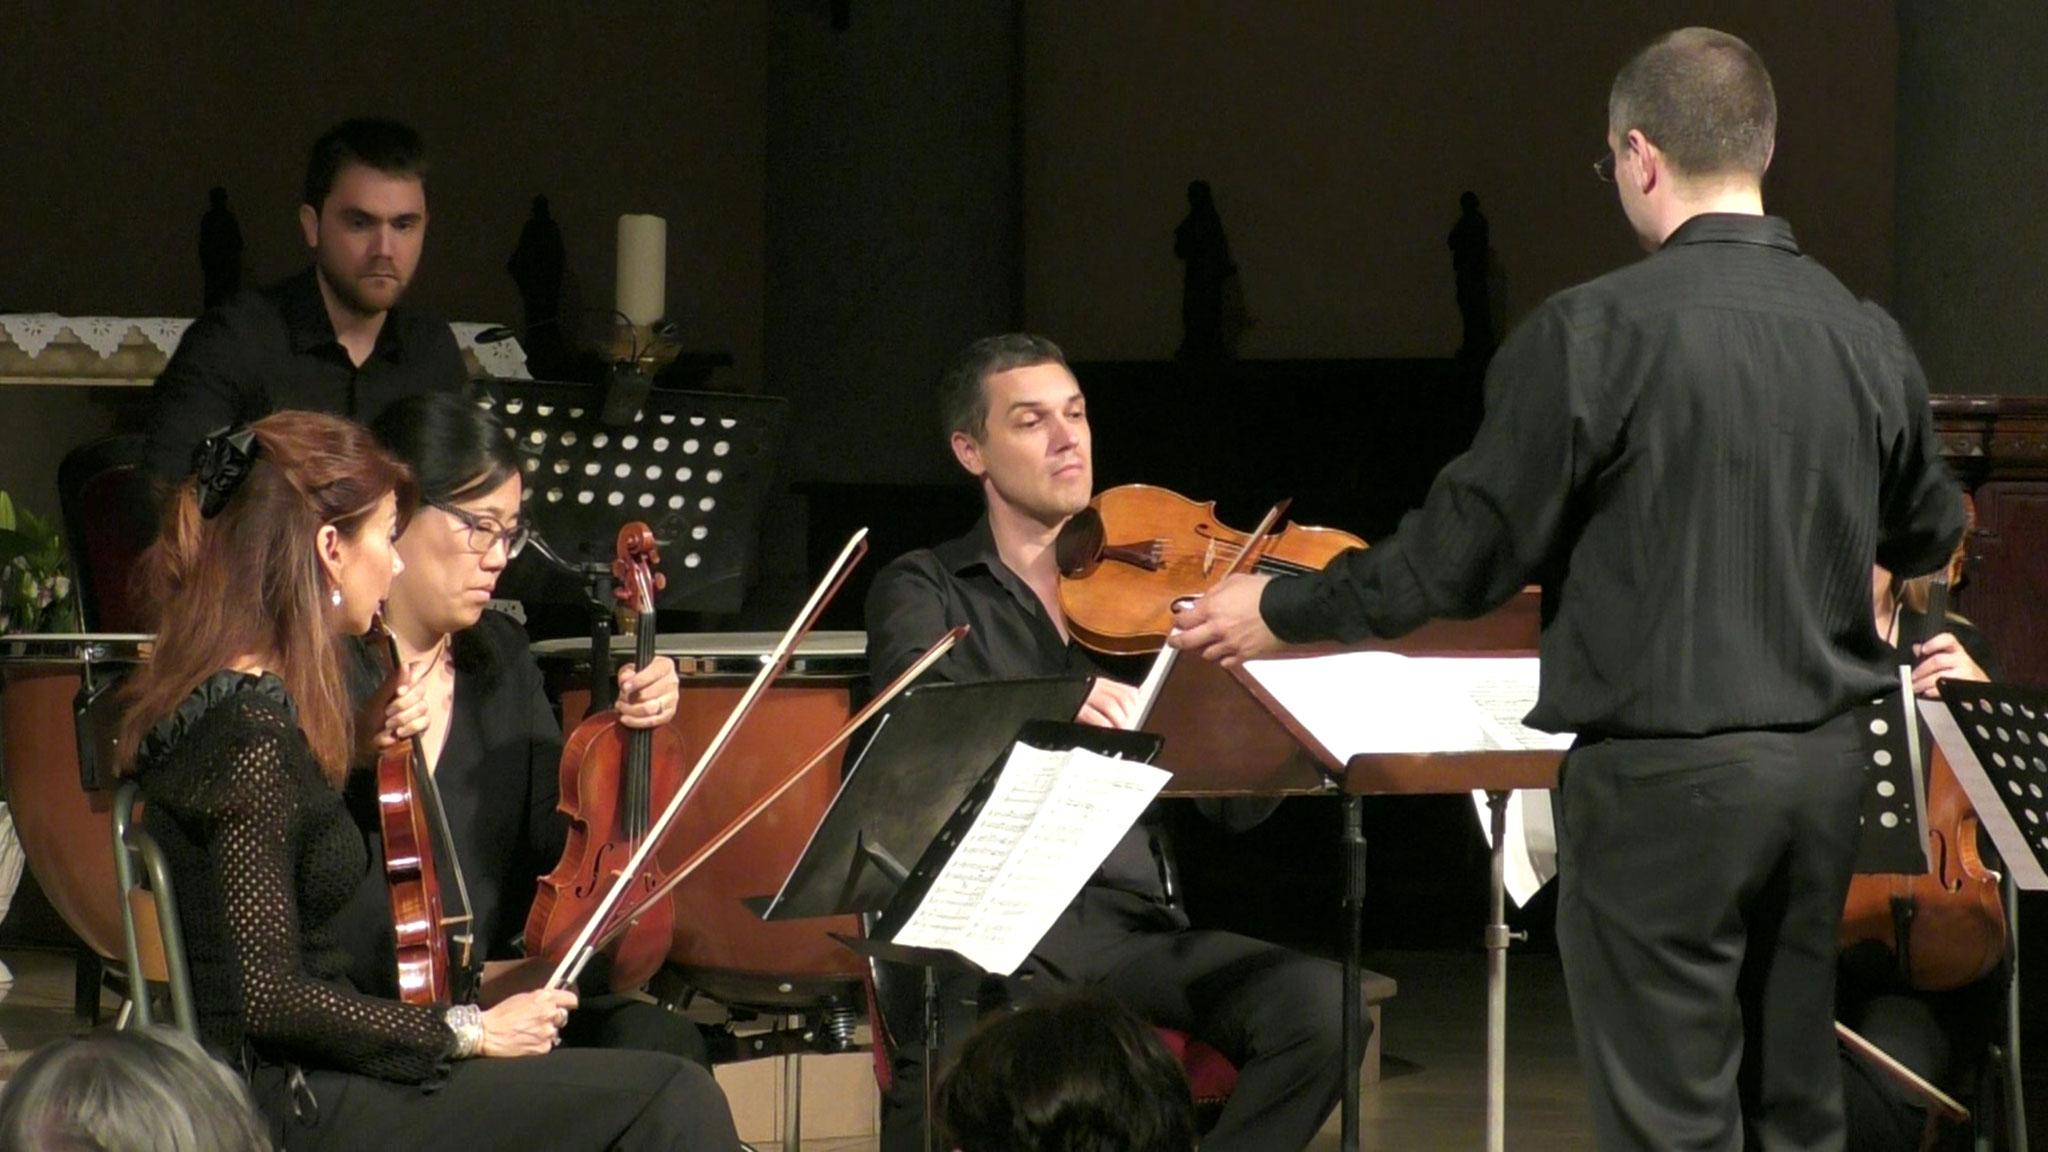 Jehan Alain 2016 - Sarabande, Alain Baldocchi  (alto), Mariko Baujard et Pauline Debourg (violons)